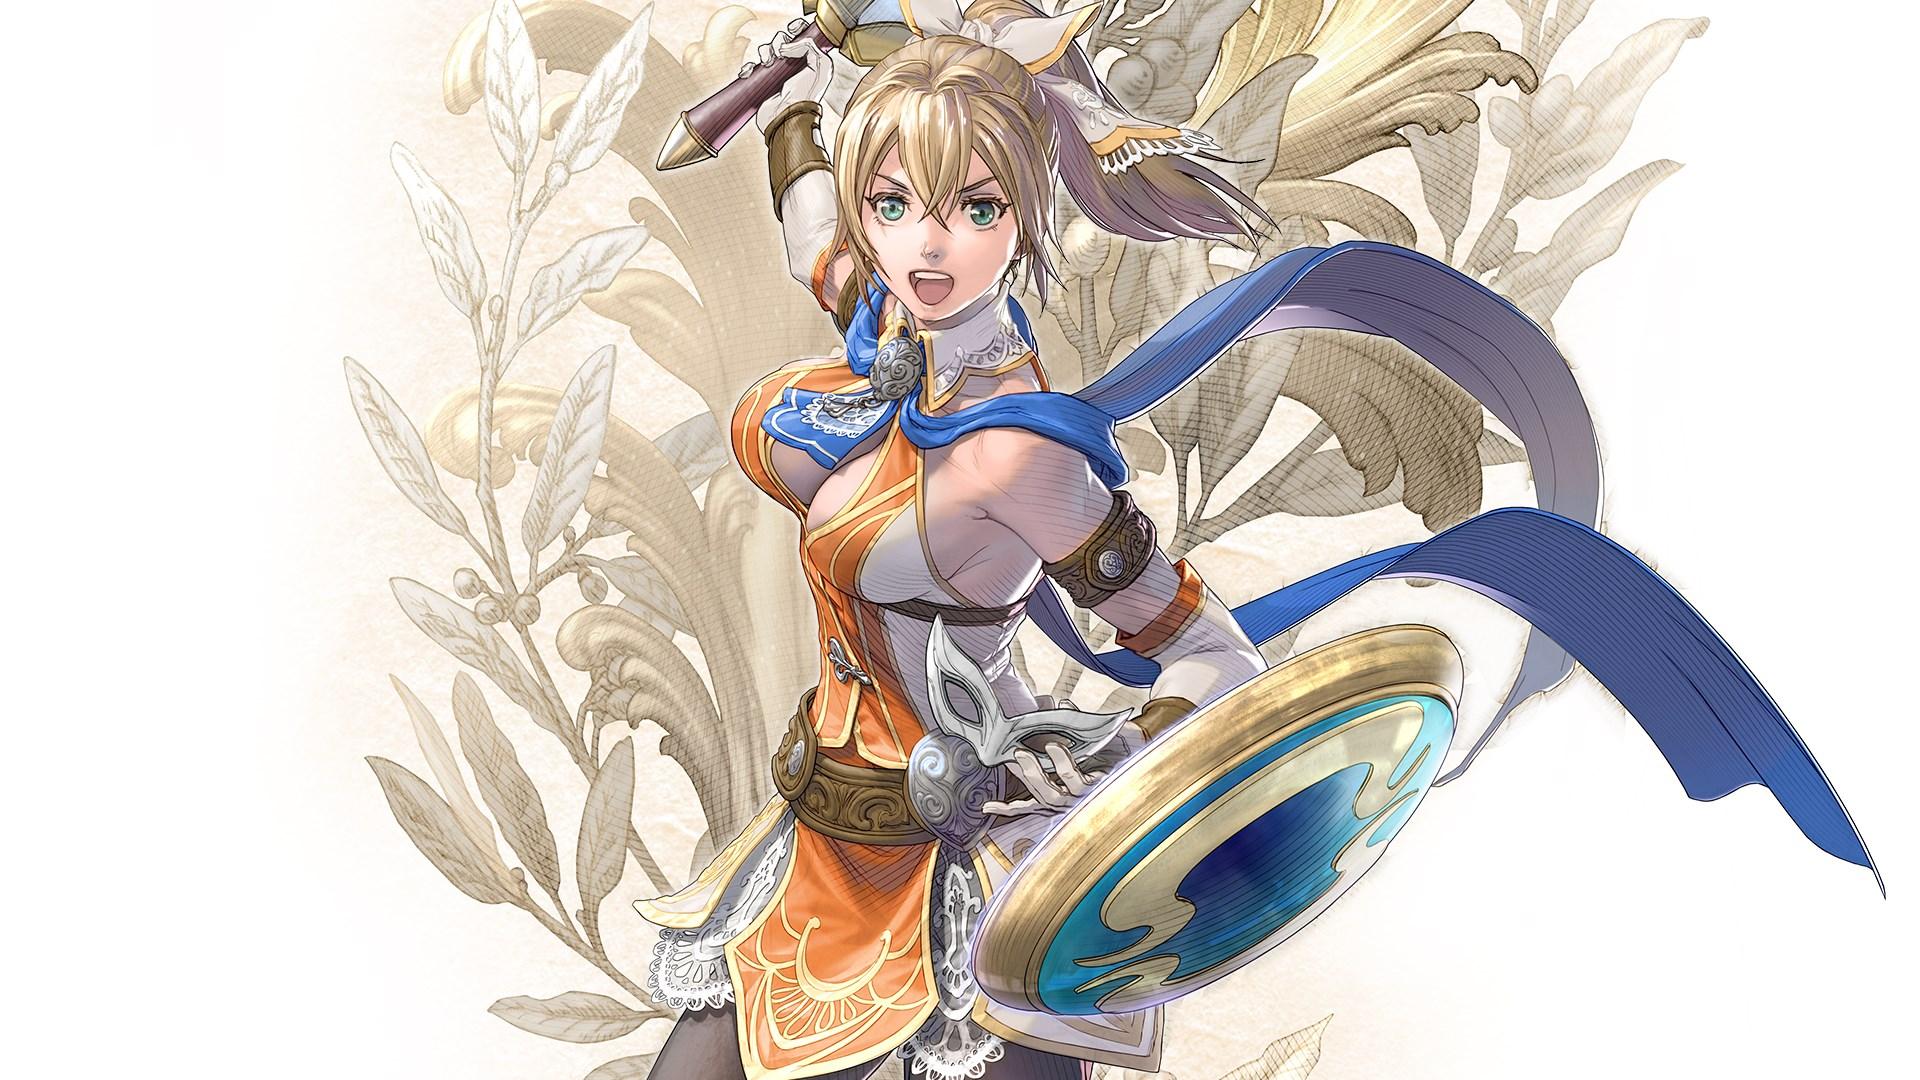 SOULCALIBUR VI - DLC6: Cassandra